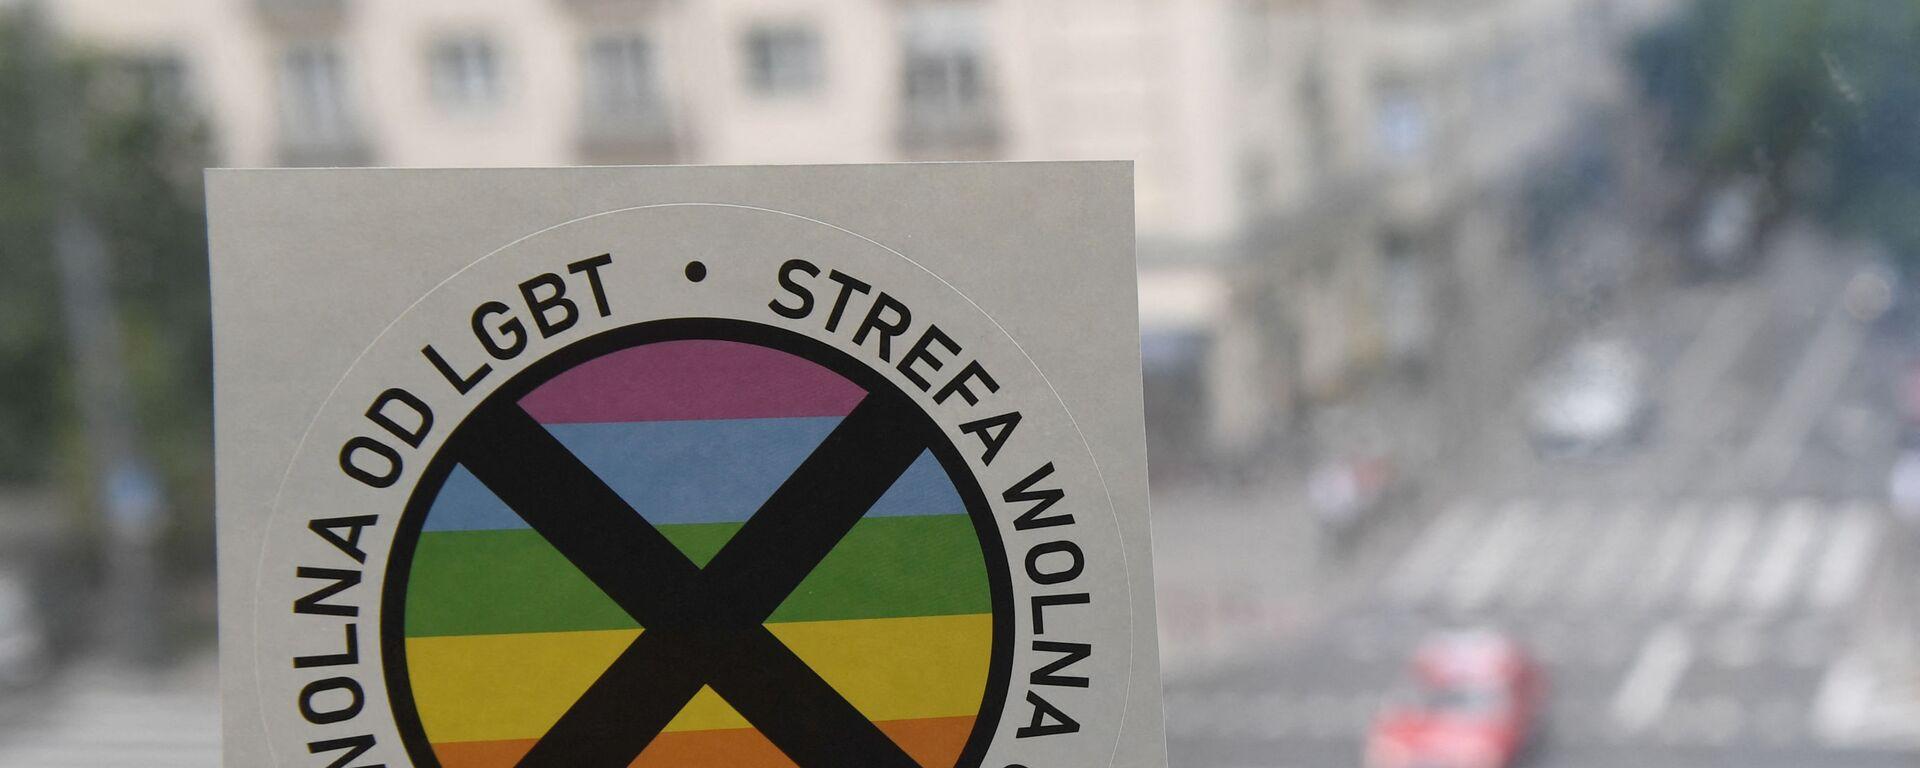 Strefa wolna od LGBT - Sputnik Polska, 1920, 29.04.2021